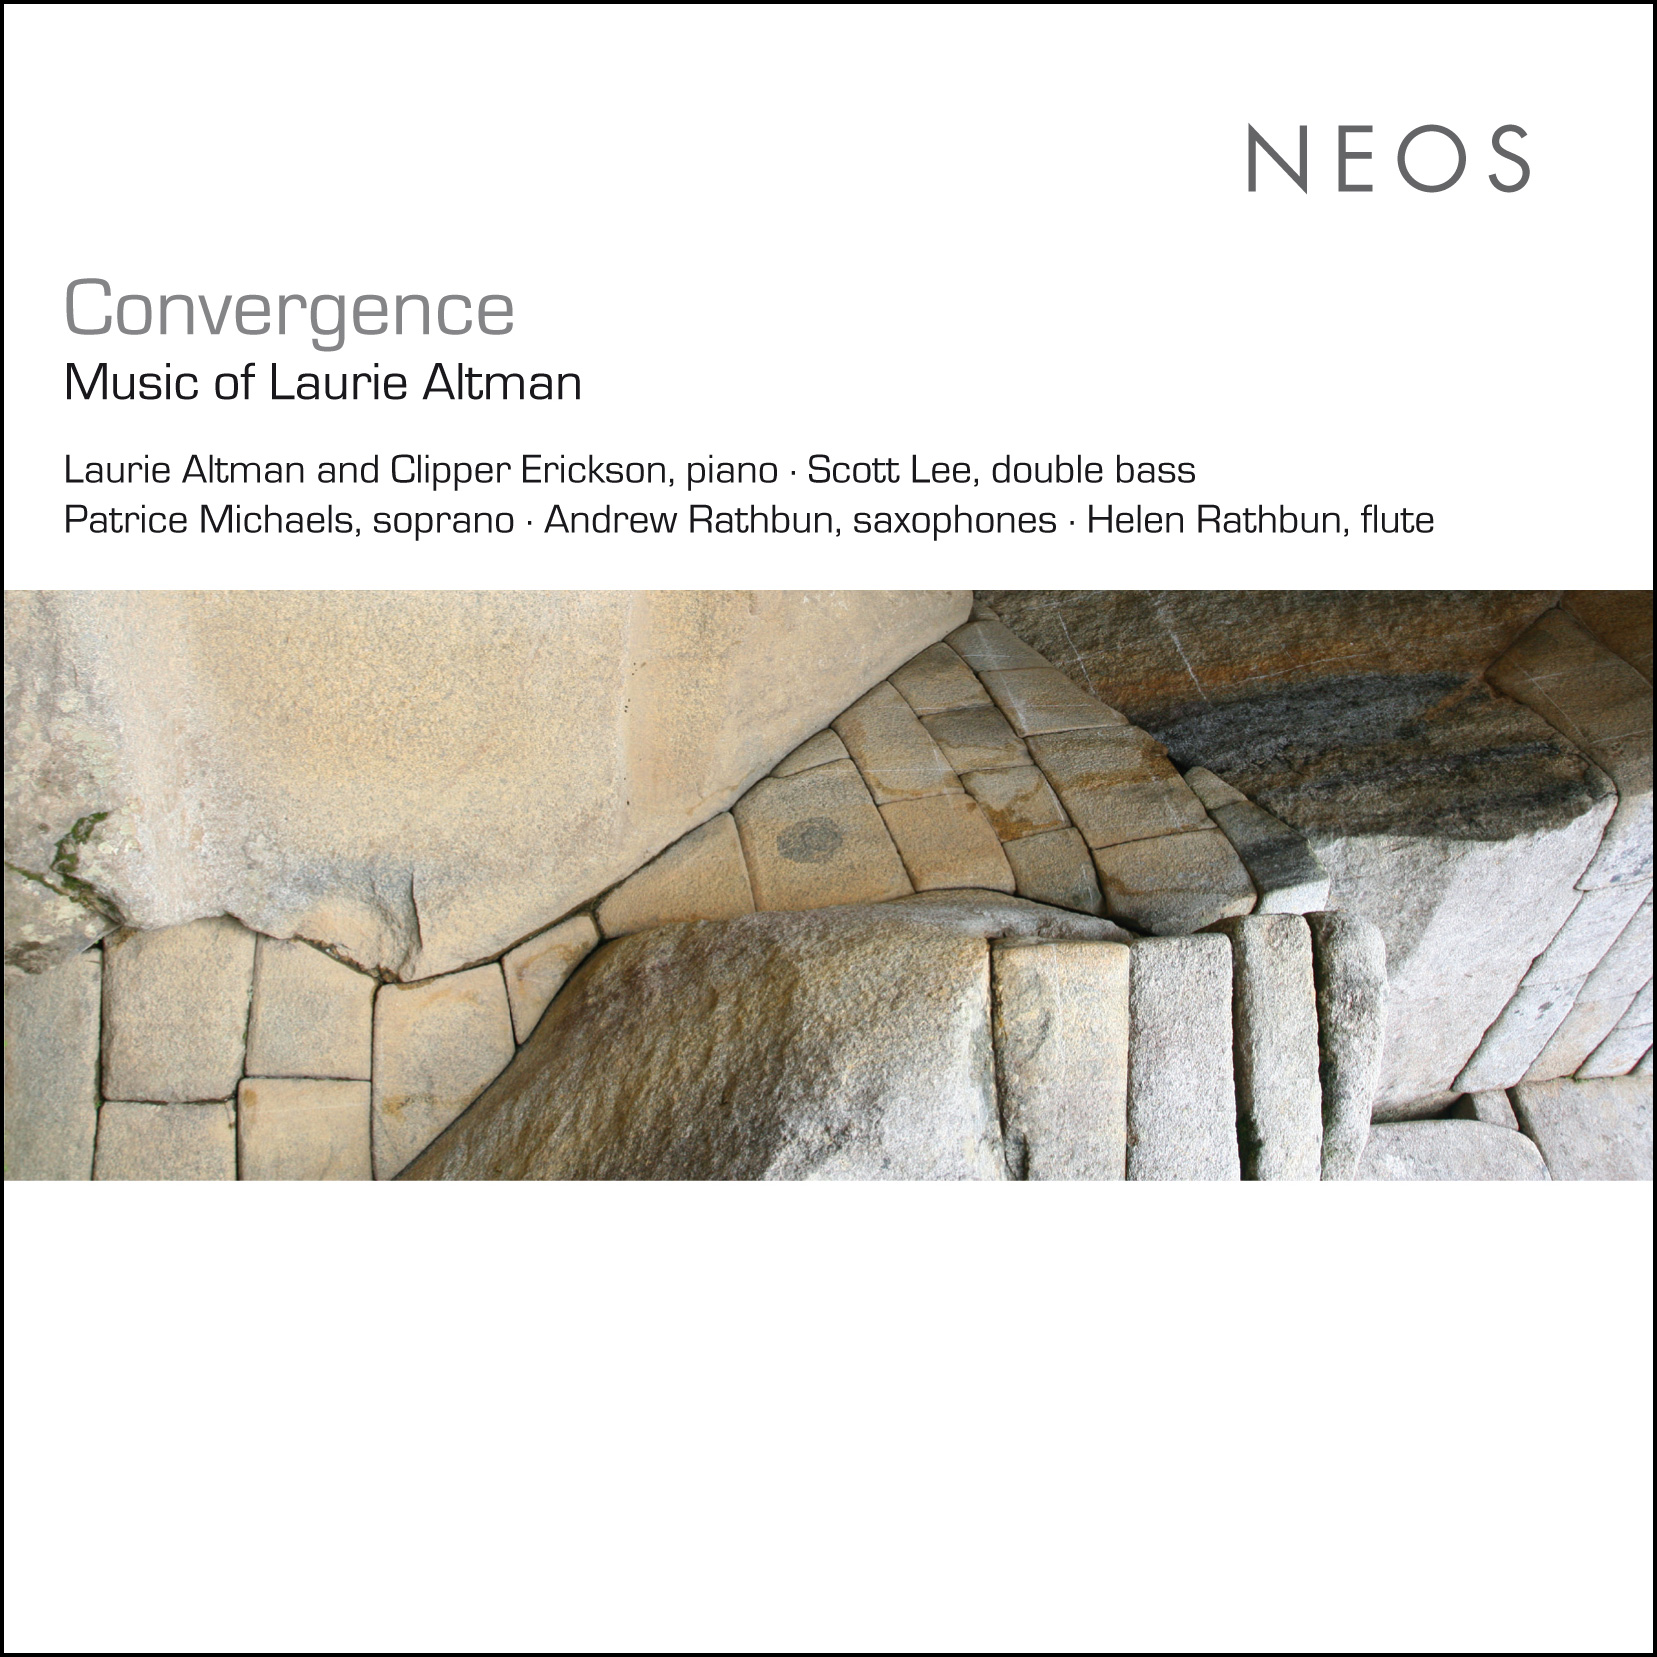 NEOS_11315_Convergence_border.jpg